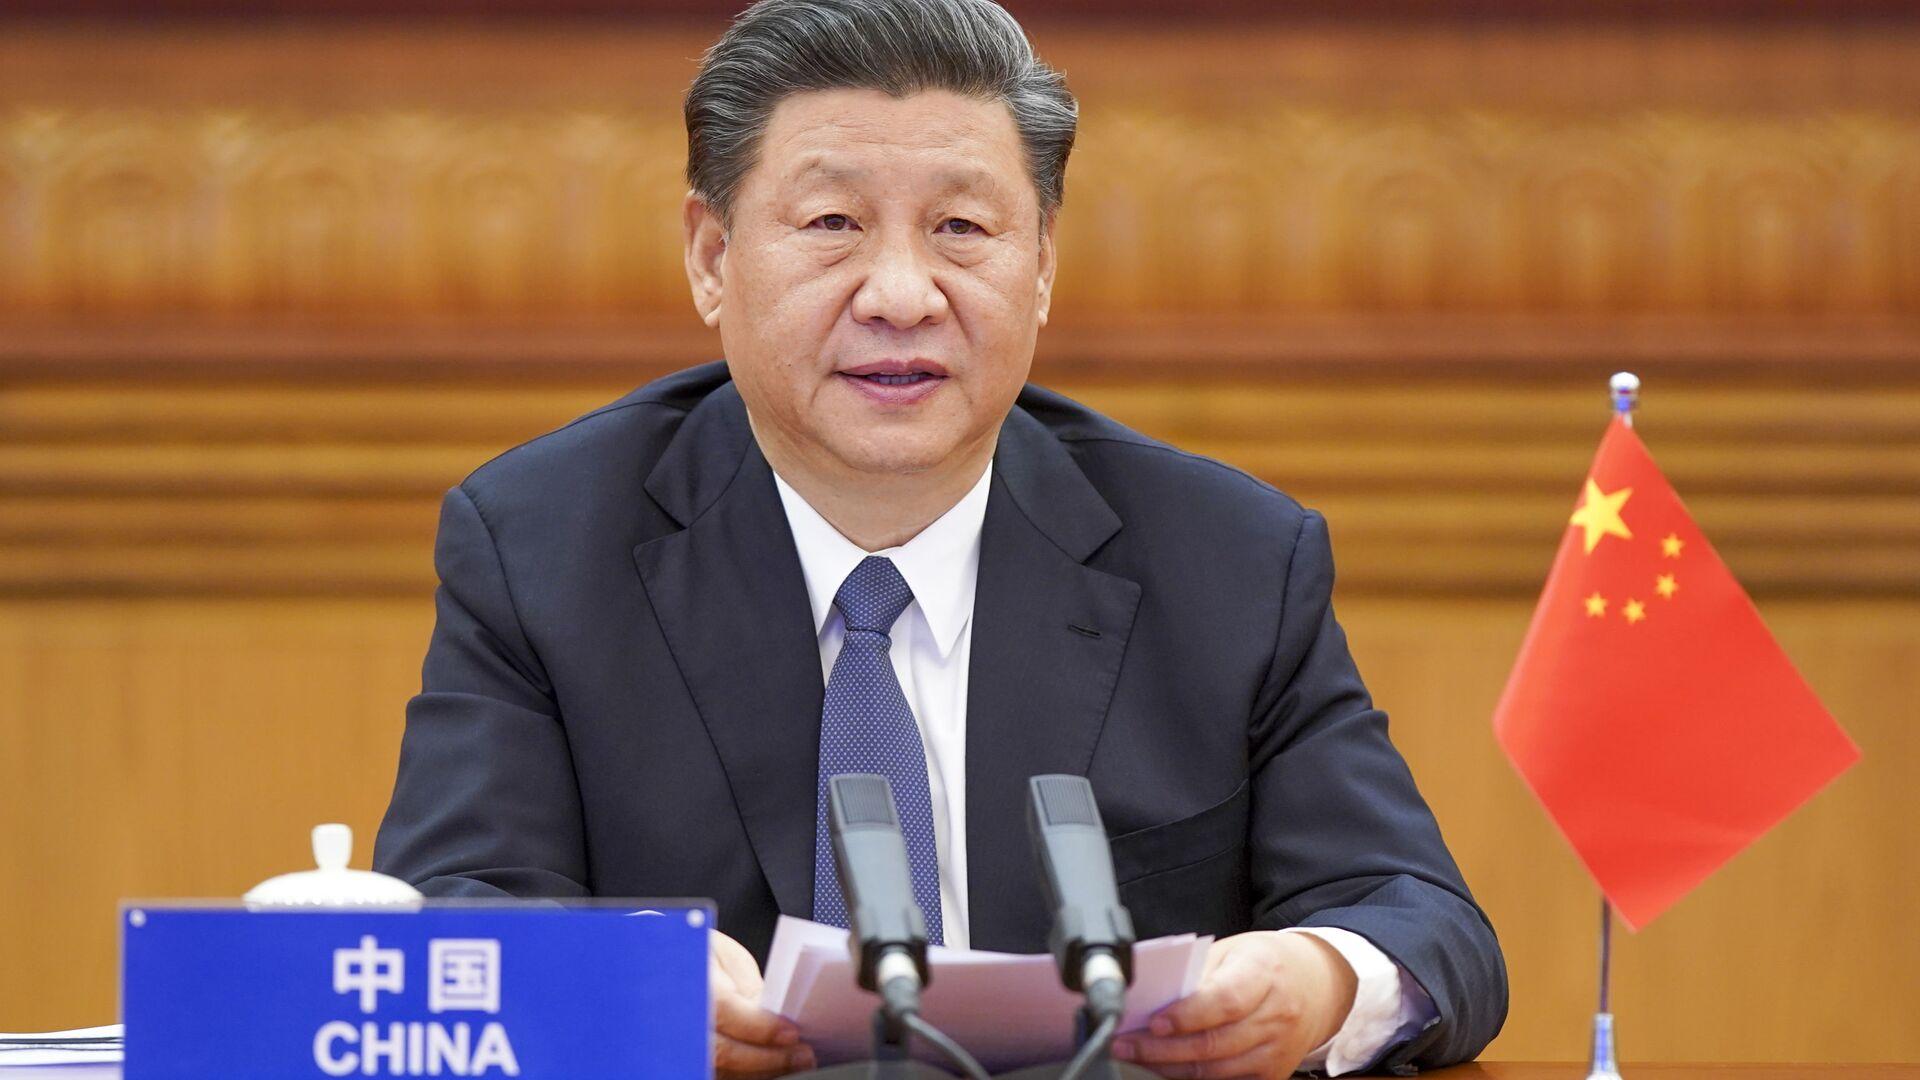 Xi Jinping la G20 in videoconferenza - Sputnik Italia, 1920, 05.08.2021